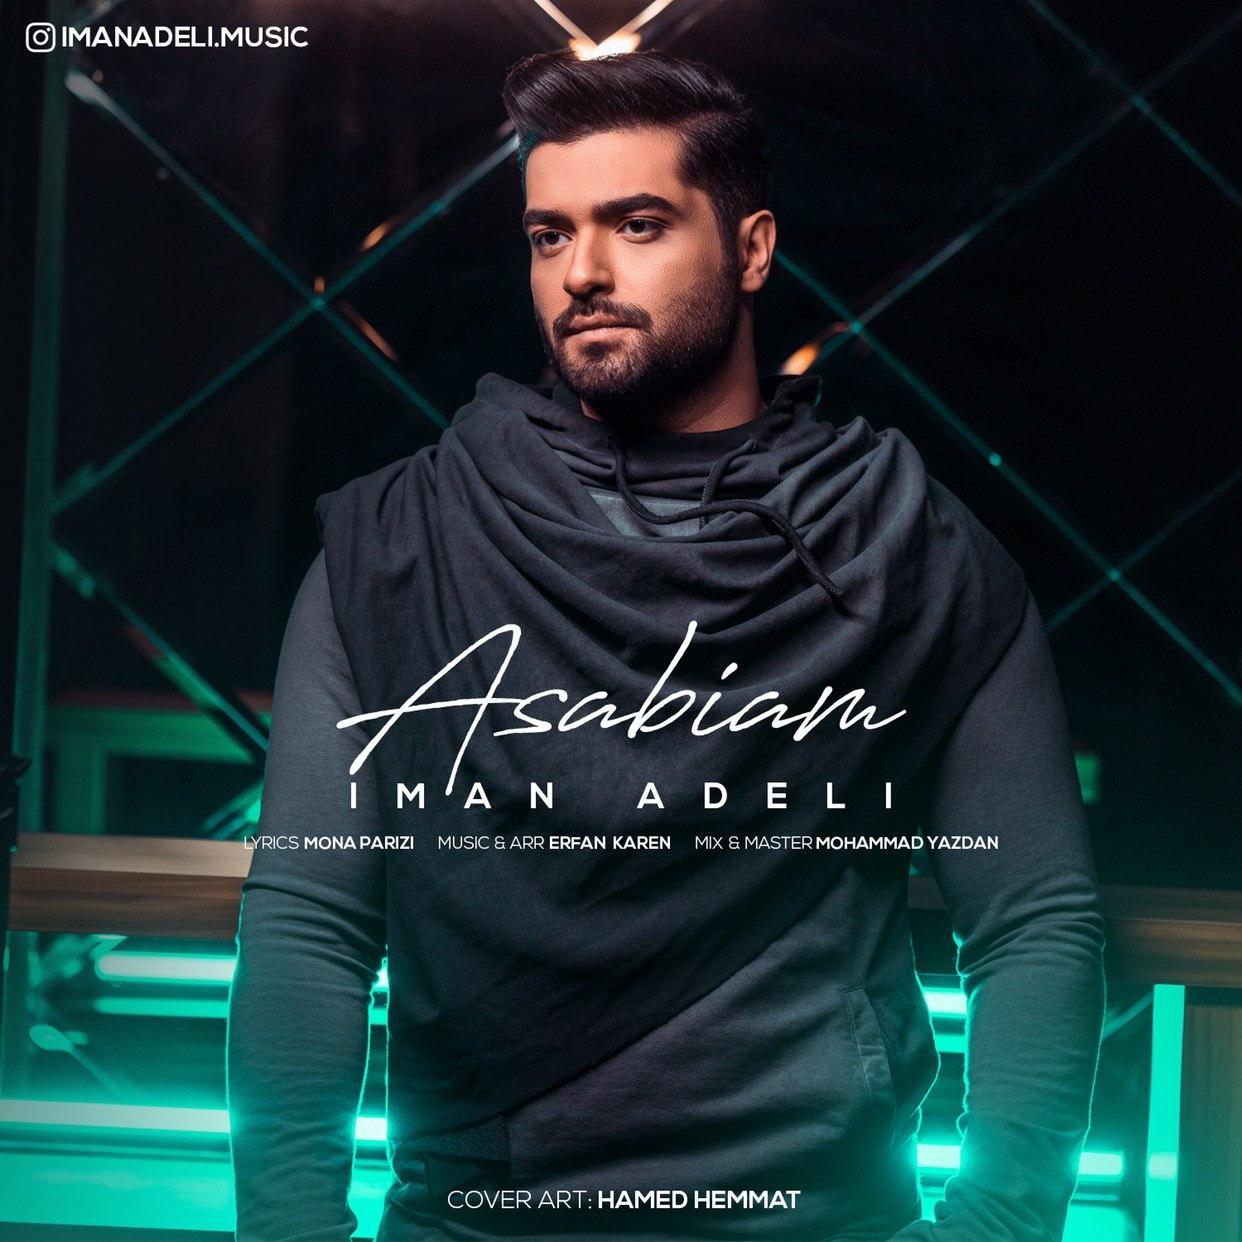 Iman Adeli – Asabiam